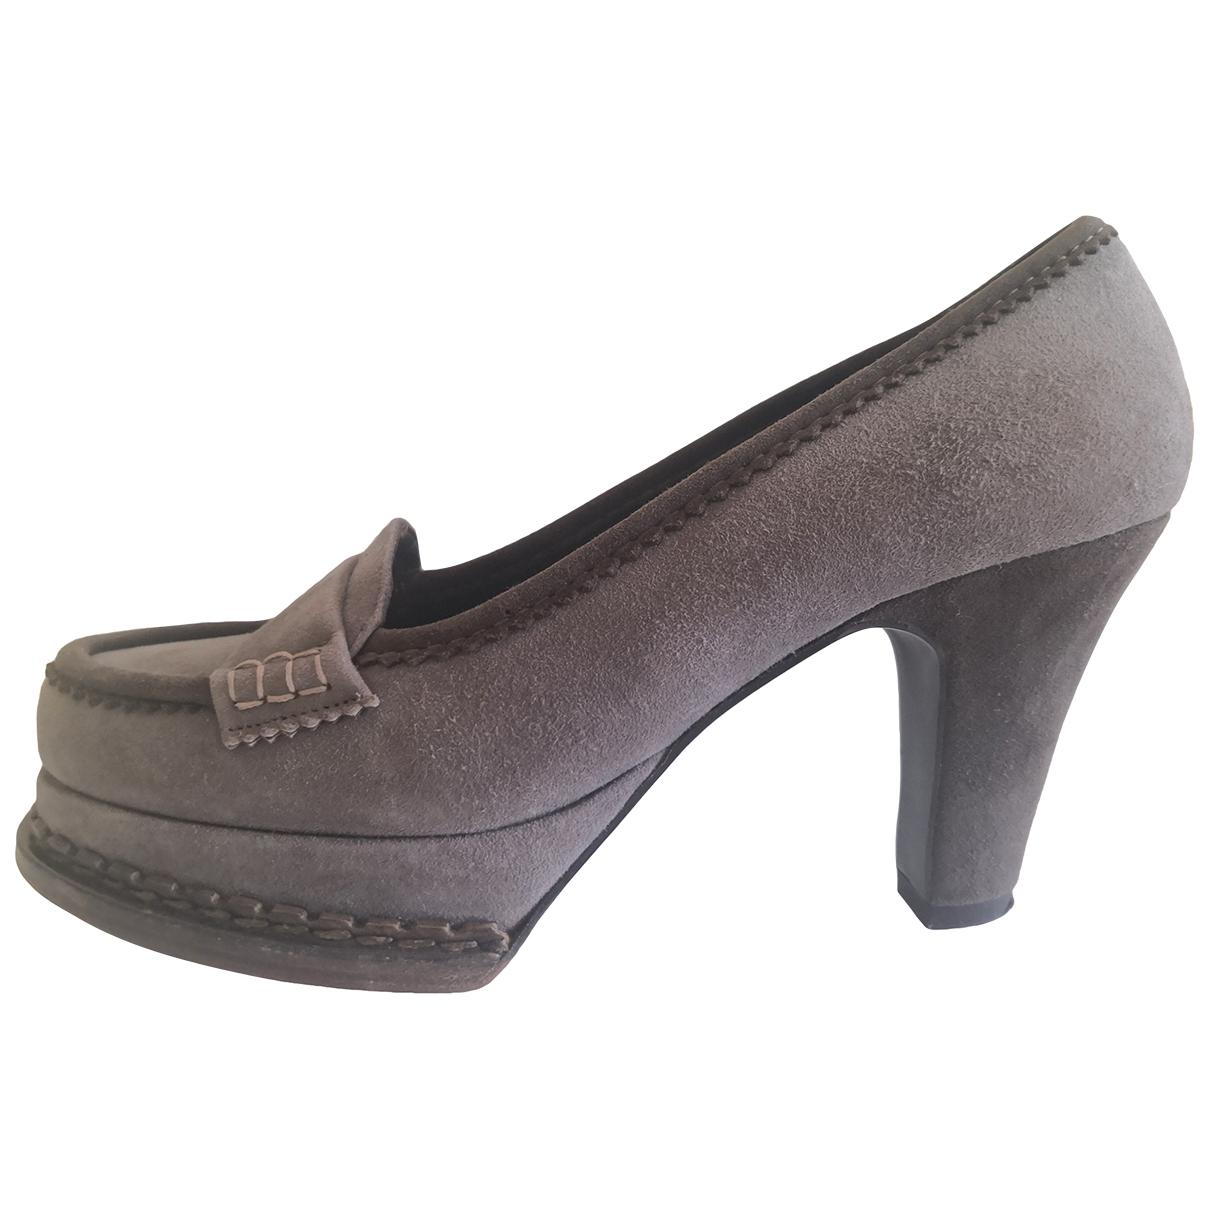 Yves Saint Laurent \N Grey Suede Heels for Women 36.5 EU